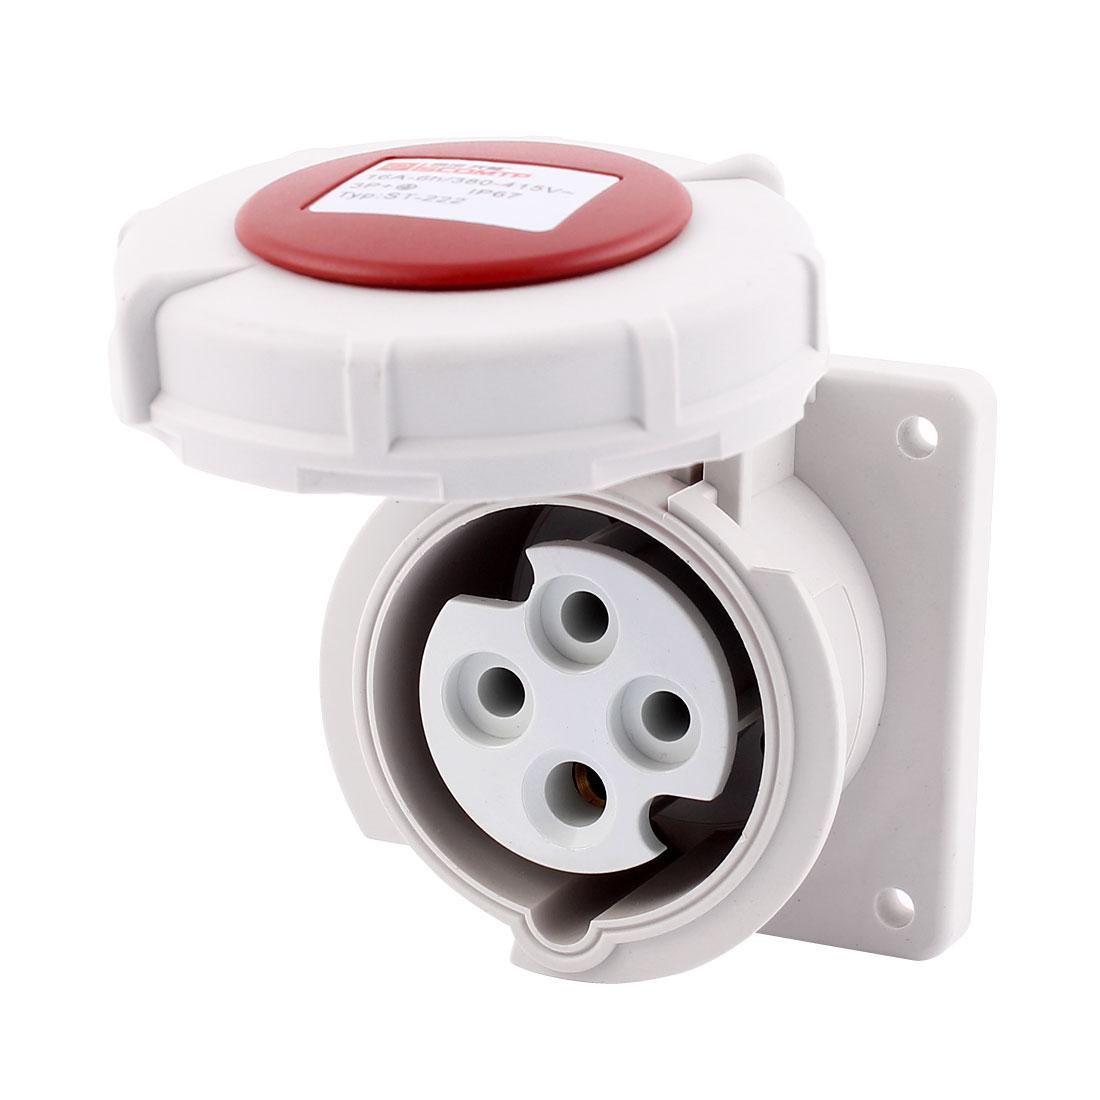 AC 380V-415V 16A IP67 3P+E 4-Terminal Female Industrial Straight Socket